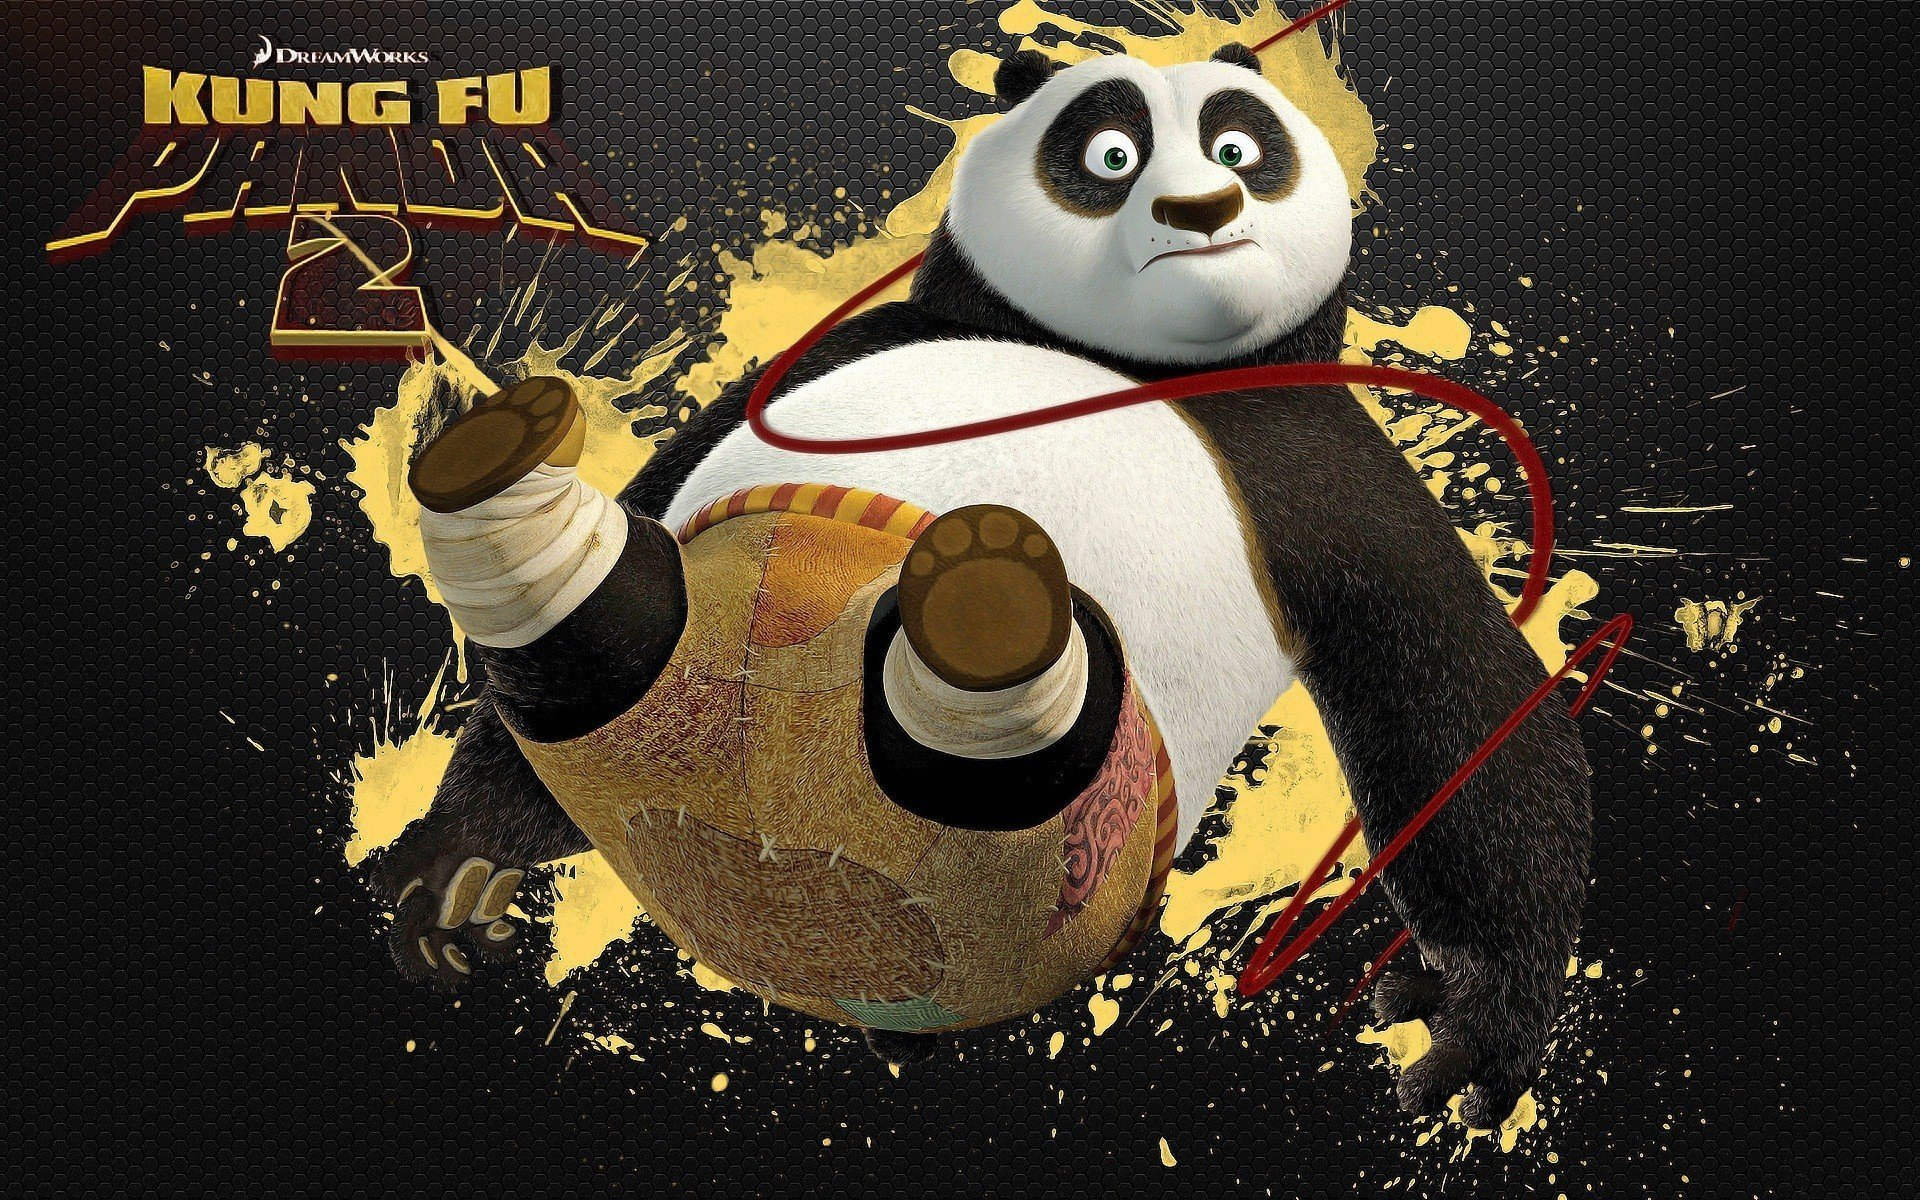 Kung Fu Panda 2 Wallpapers Hd For Desktop Backgrounds